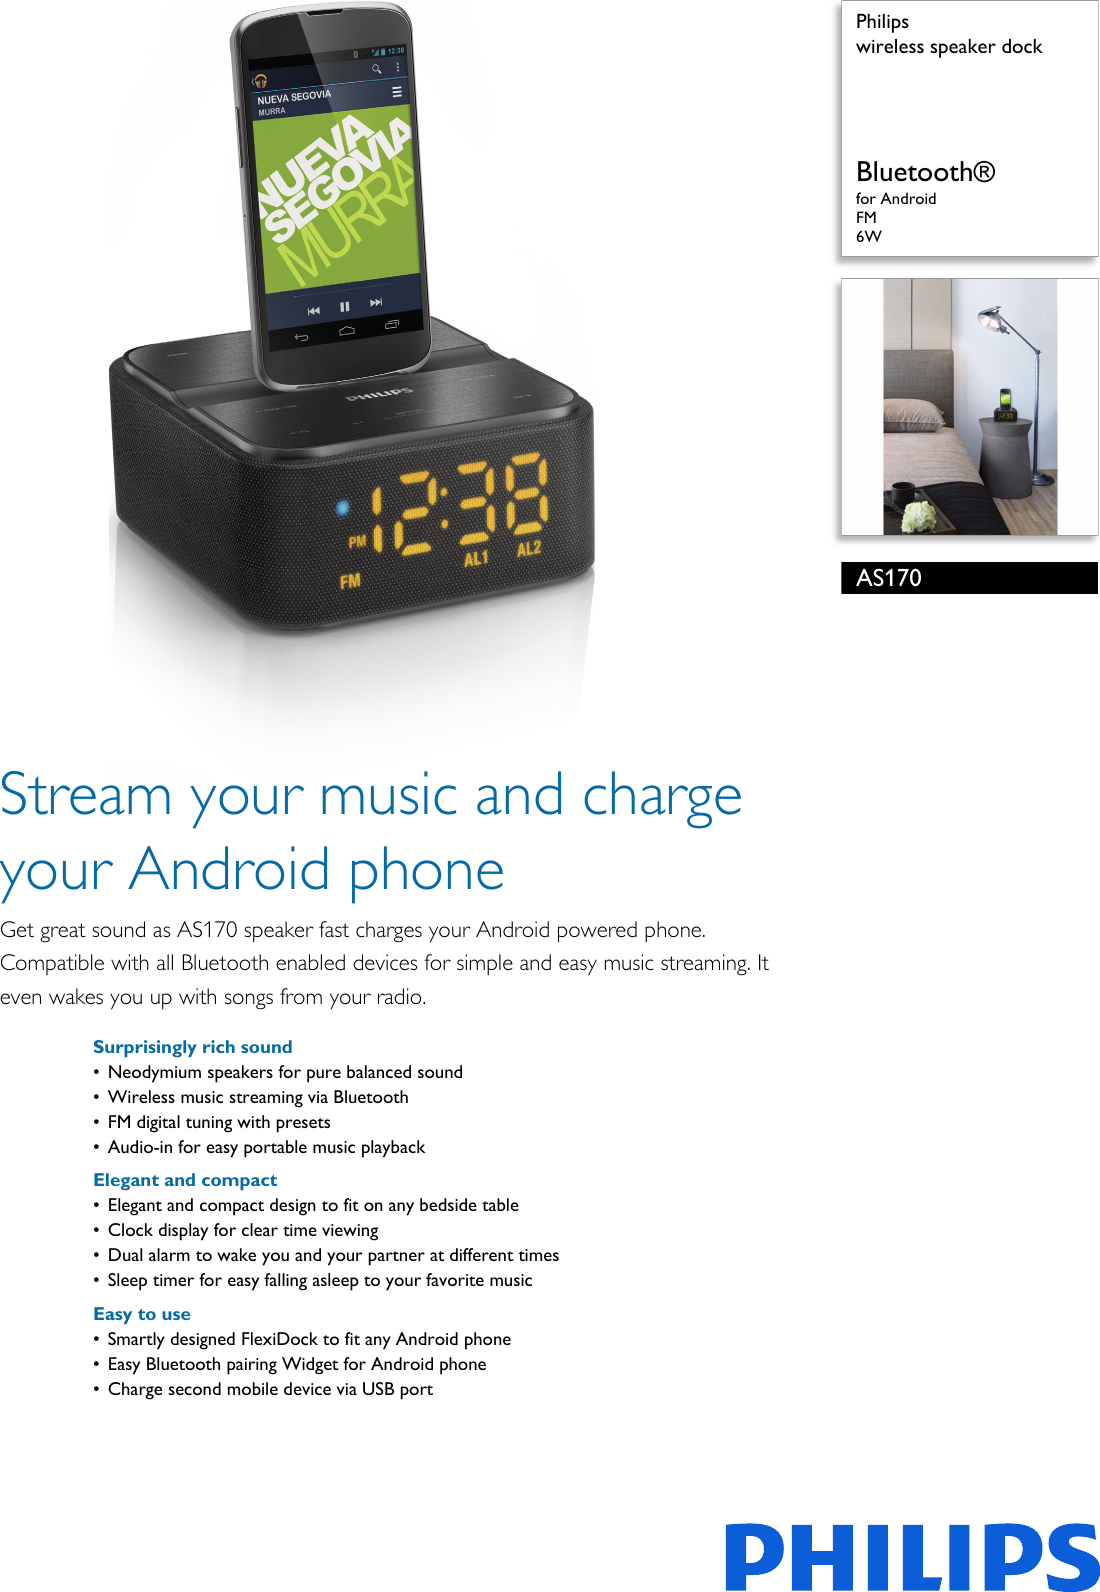 Philips AS170/12 Wireless Speaker Dock Leaflet As170 12 Pss Engmy